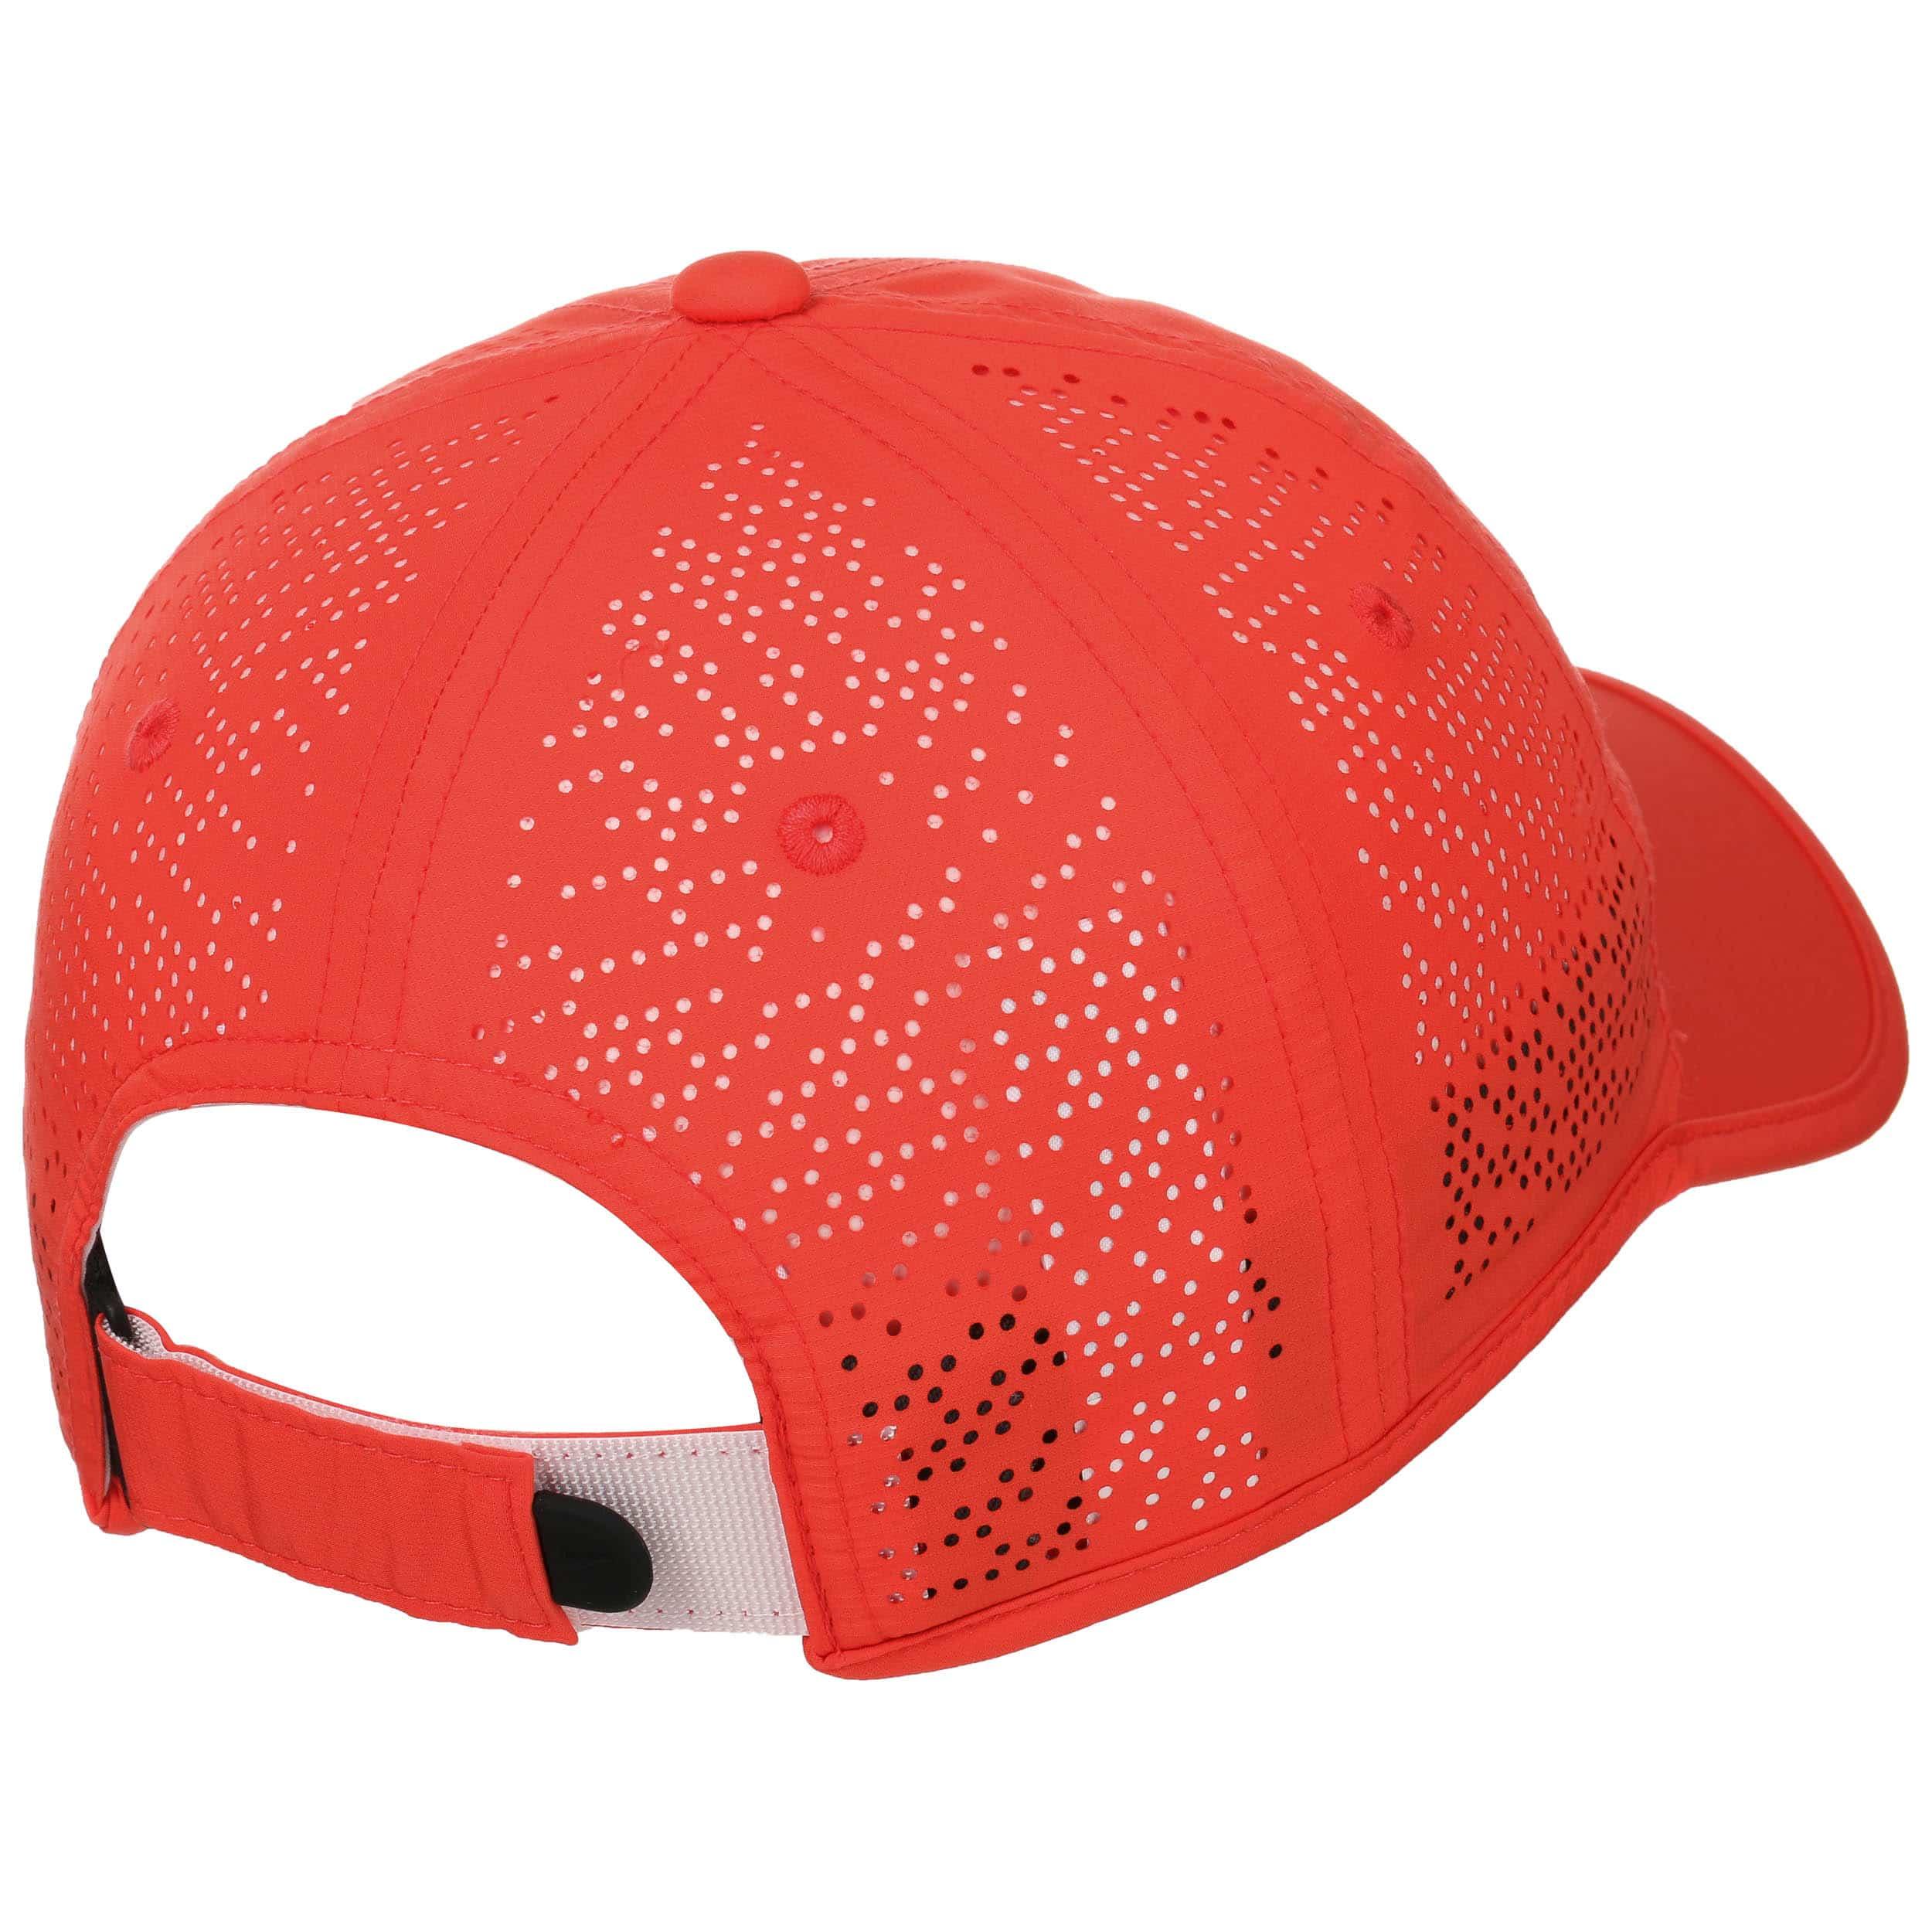 Gorra Swoosh Perforation Cap by Nike - Gorras - sombreroshop.es a790dce7a9e